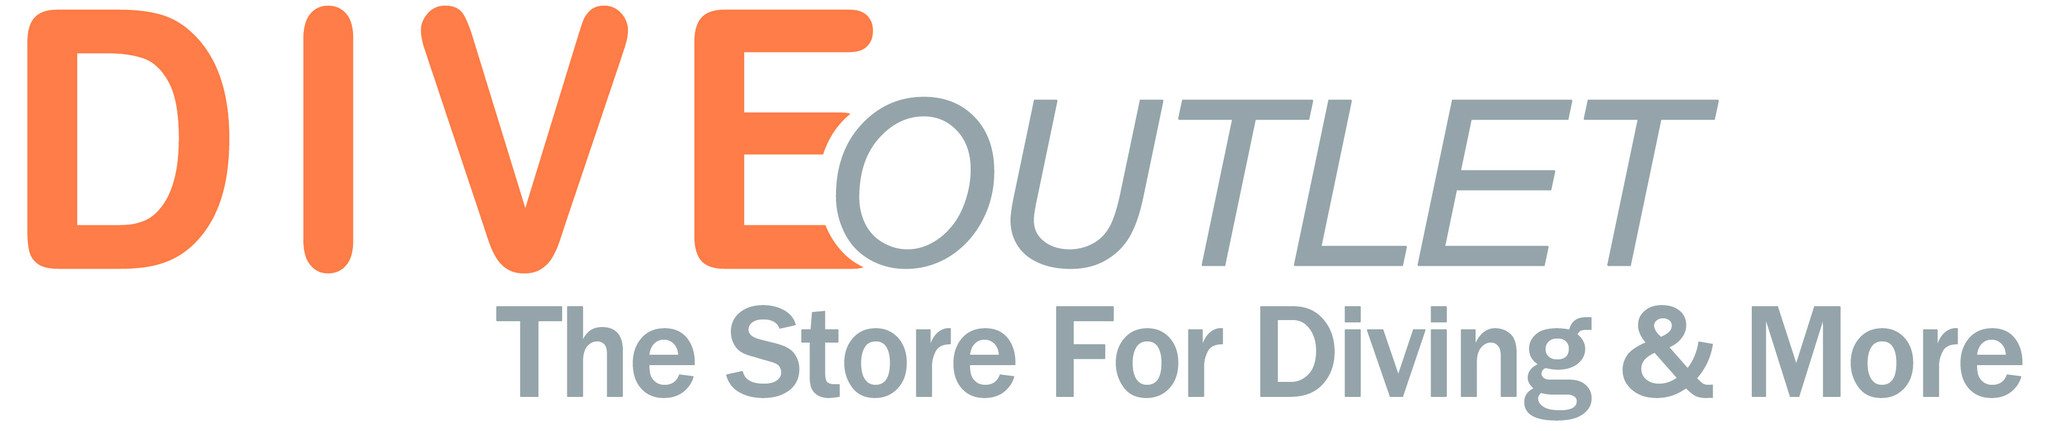 Diveoutlet logo